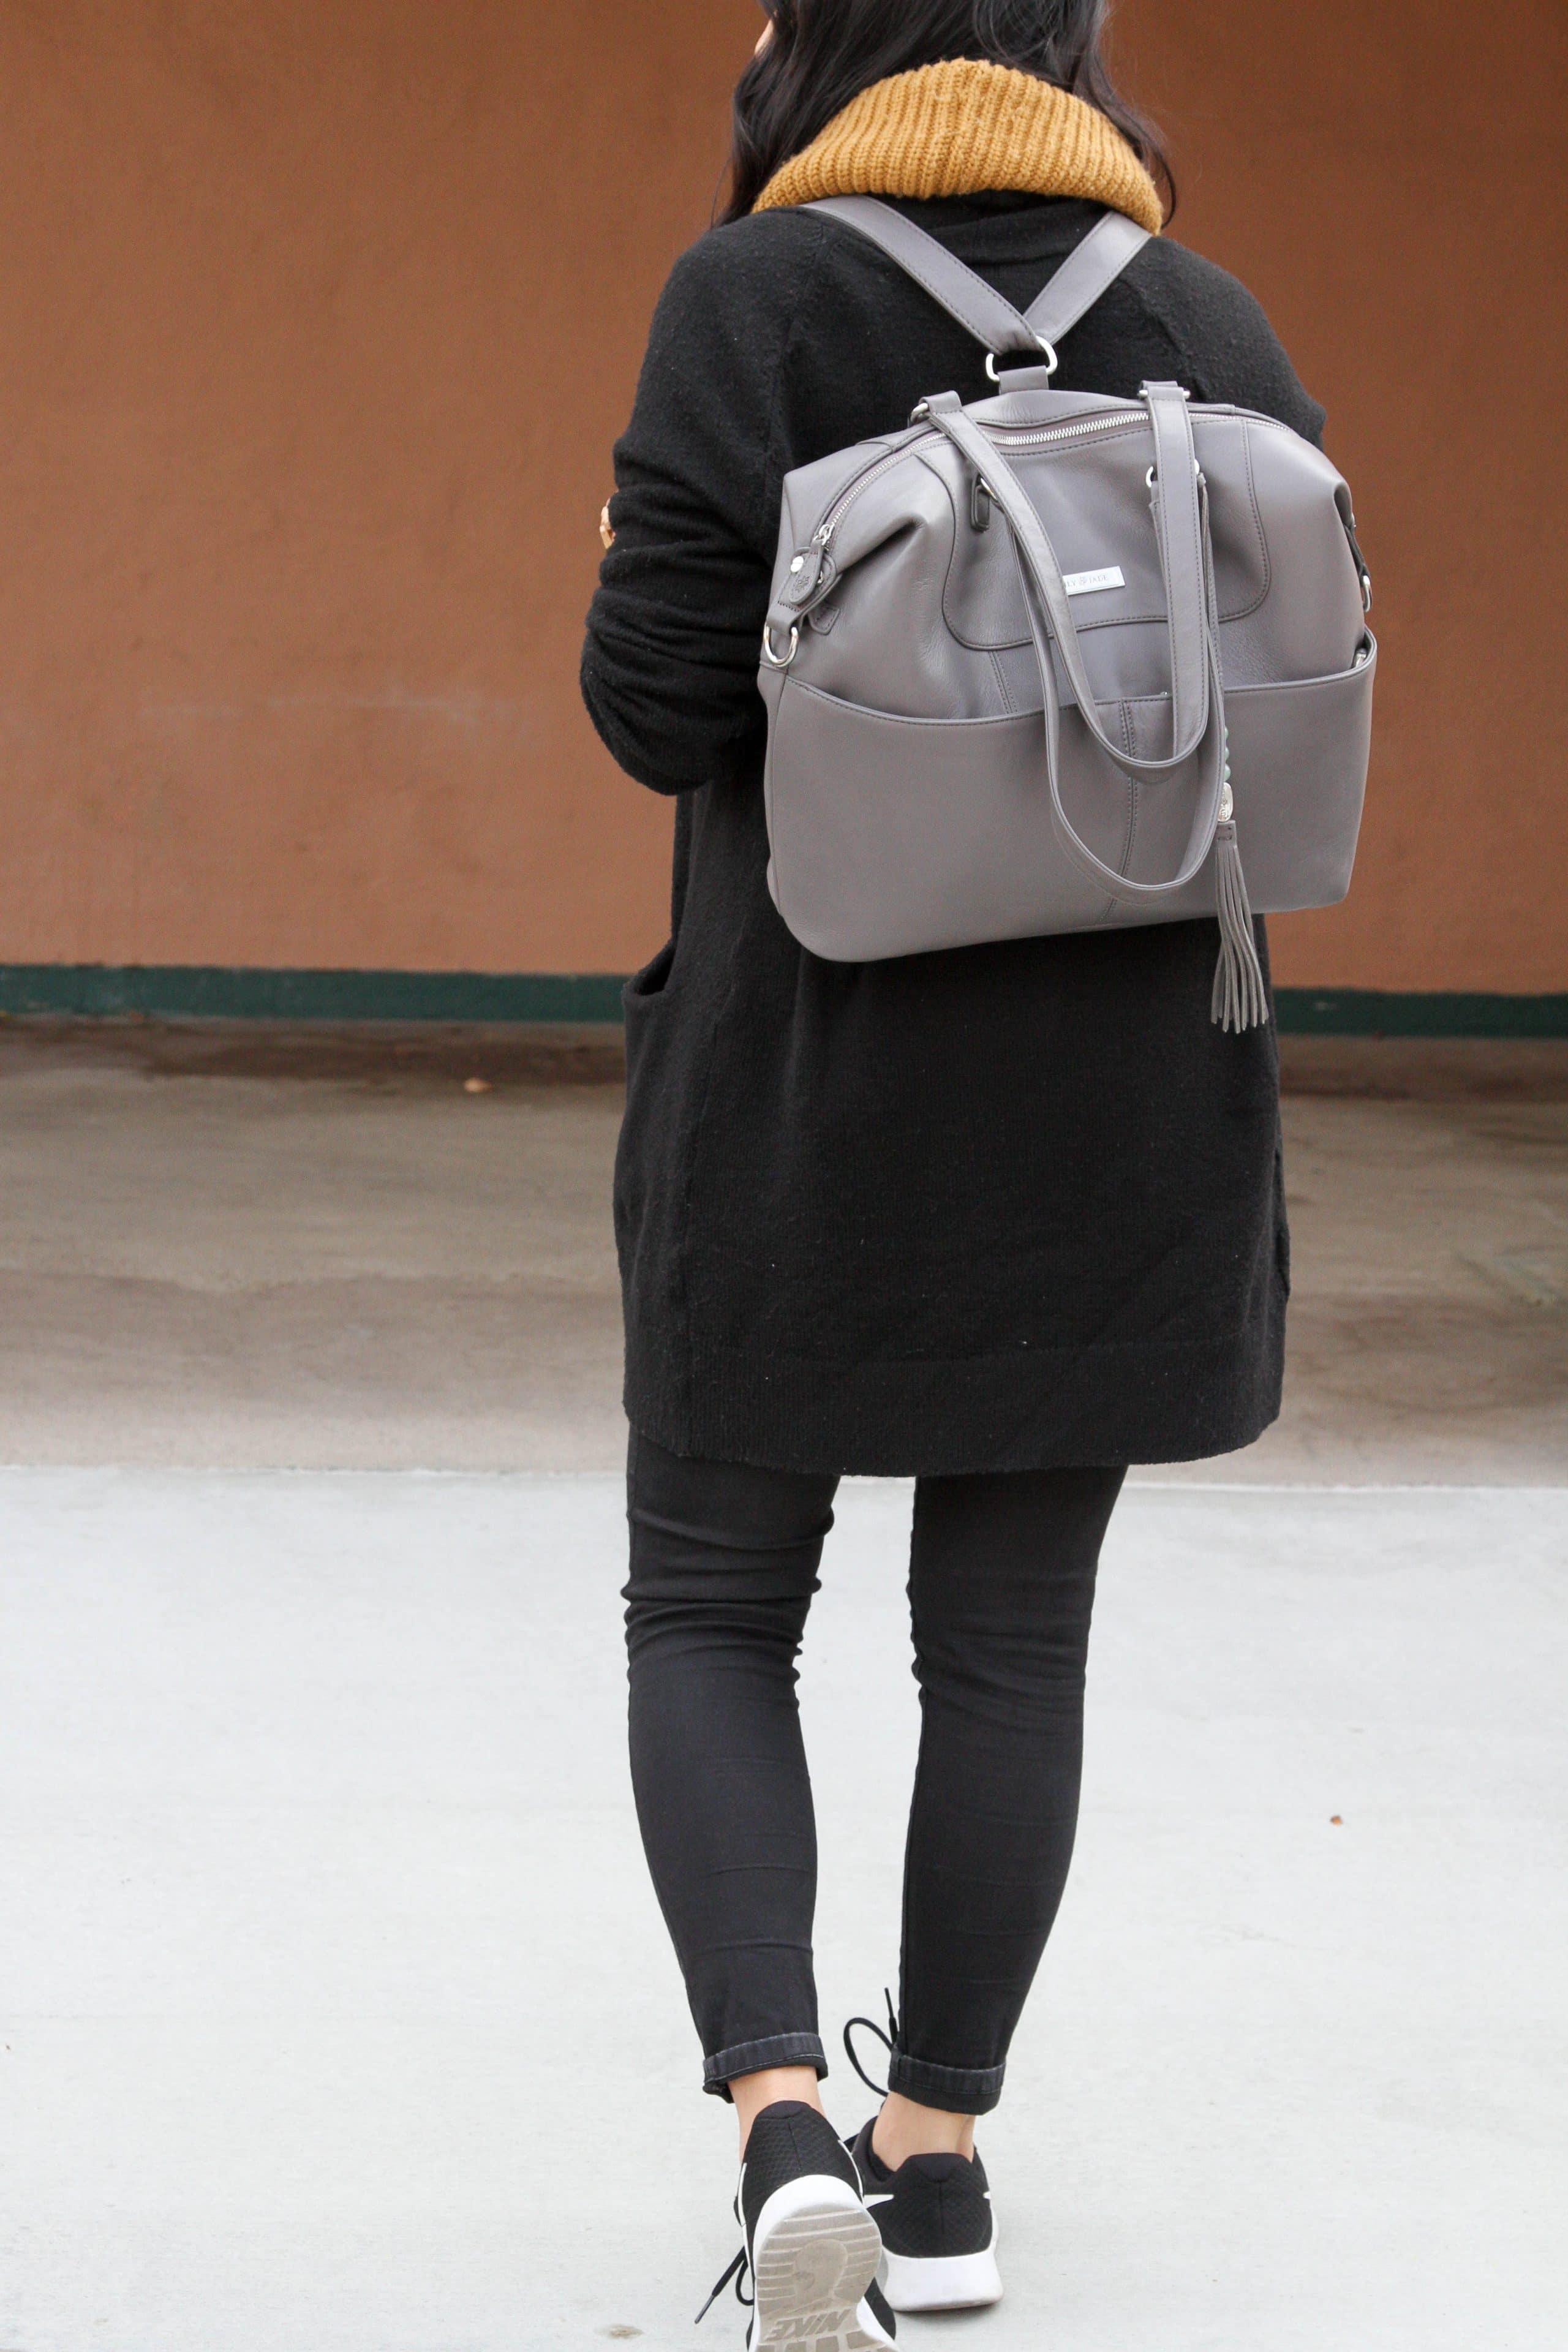 Travel Look: Black Cardigan + Black Jeans + Sneakers + Gray Bag